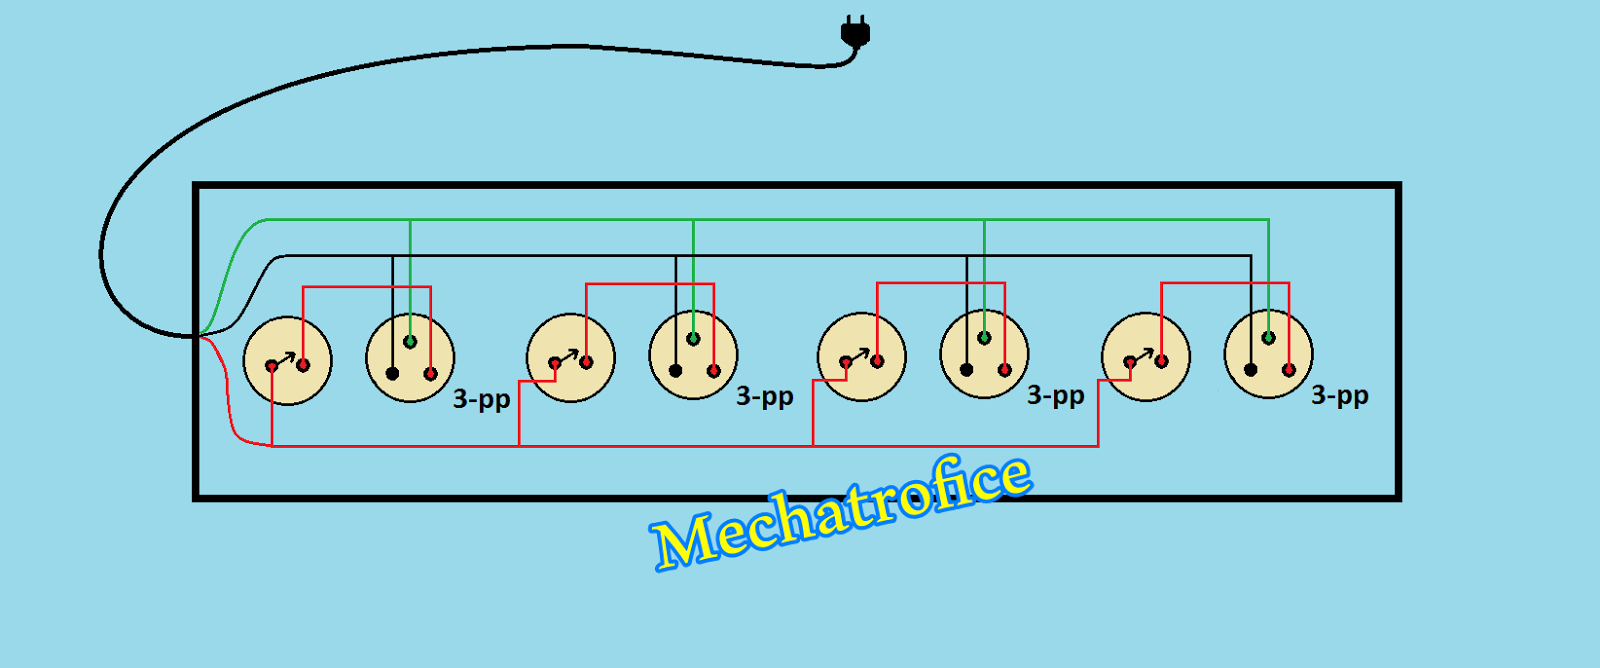 Extension cord wiring diagram   Mechatrofice